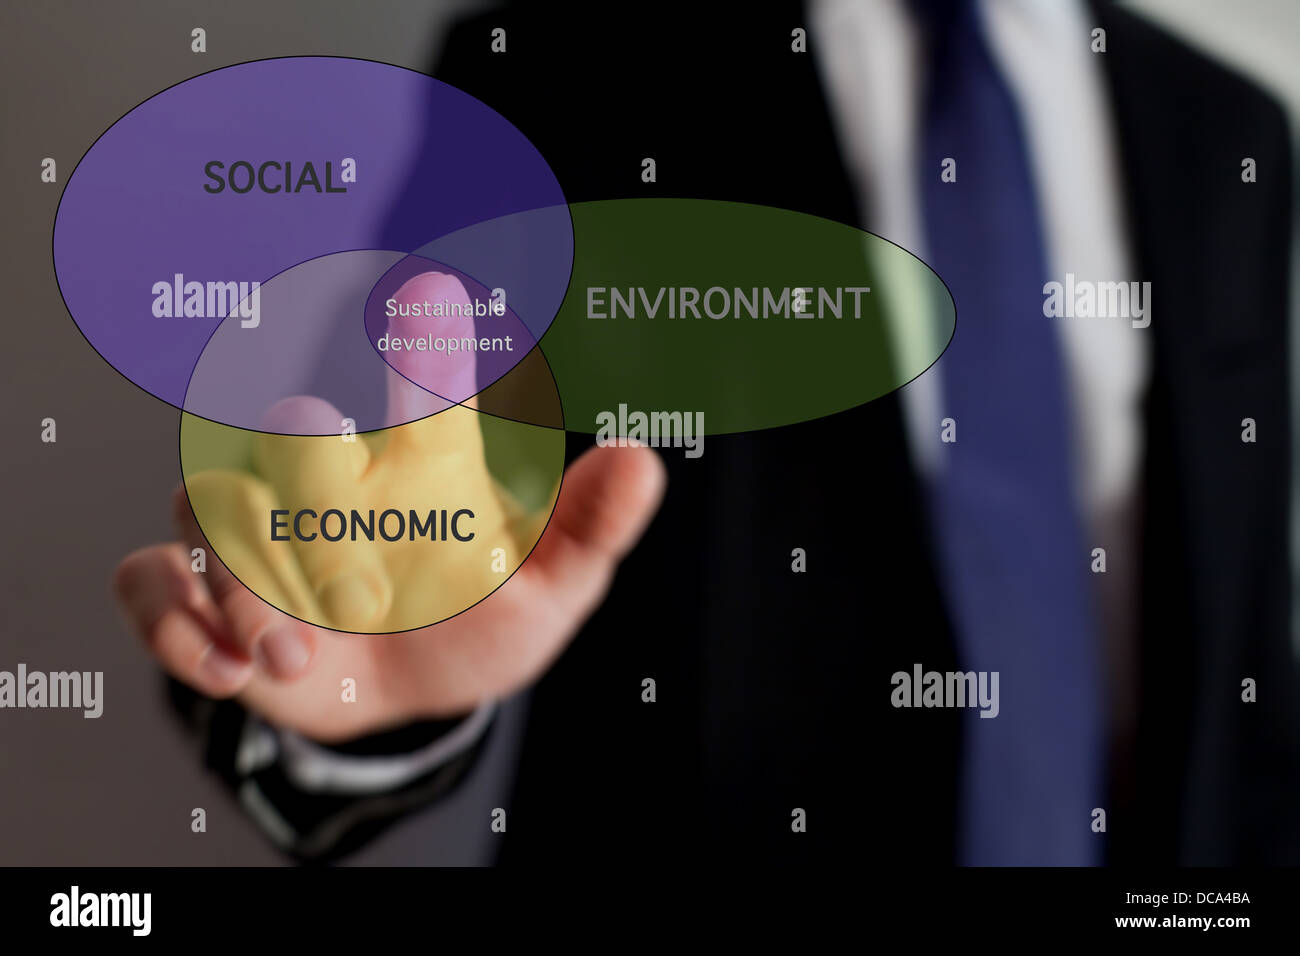 sustainable development - Stock Image